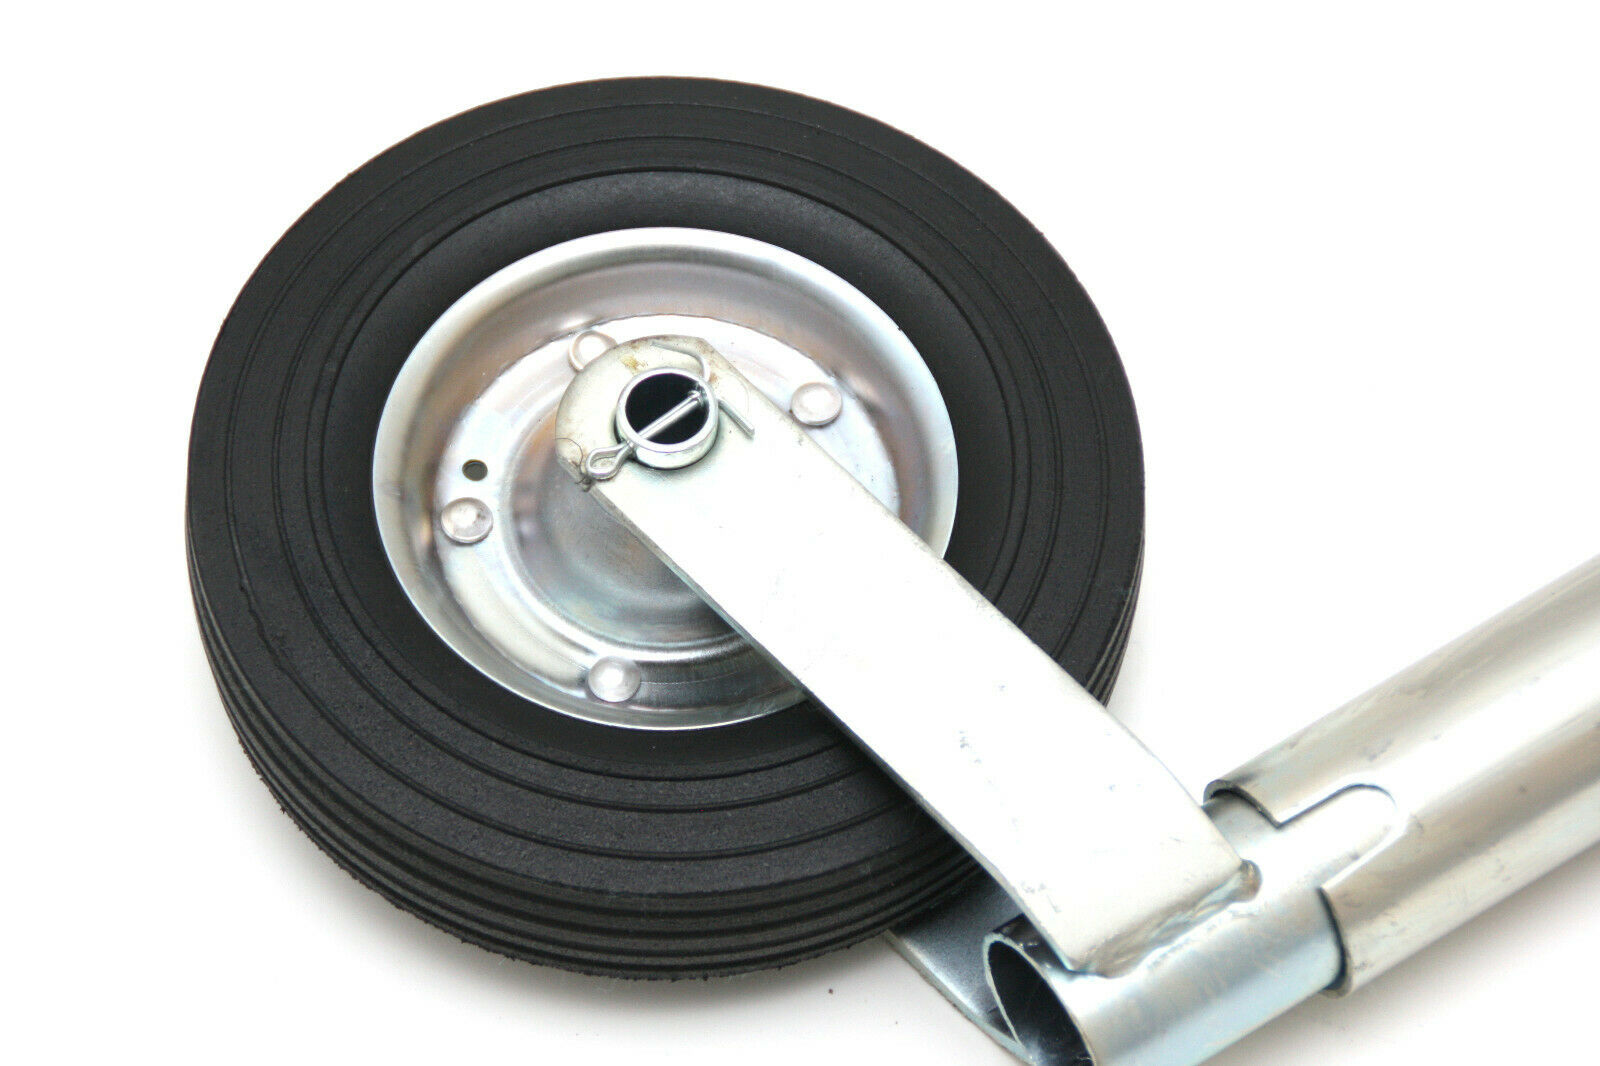 Schraubensatz Klemmhalter Klemmschelle Anhängerstützrad 300 kg Ø 60 mm